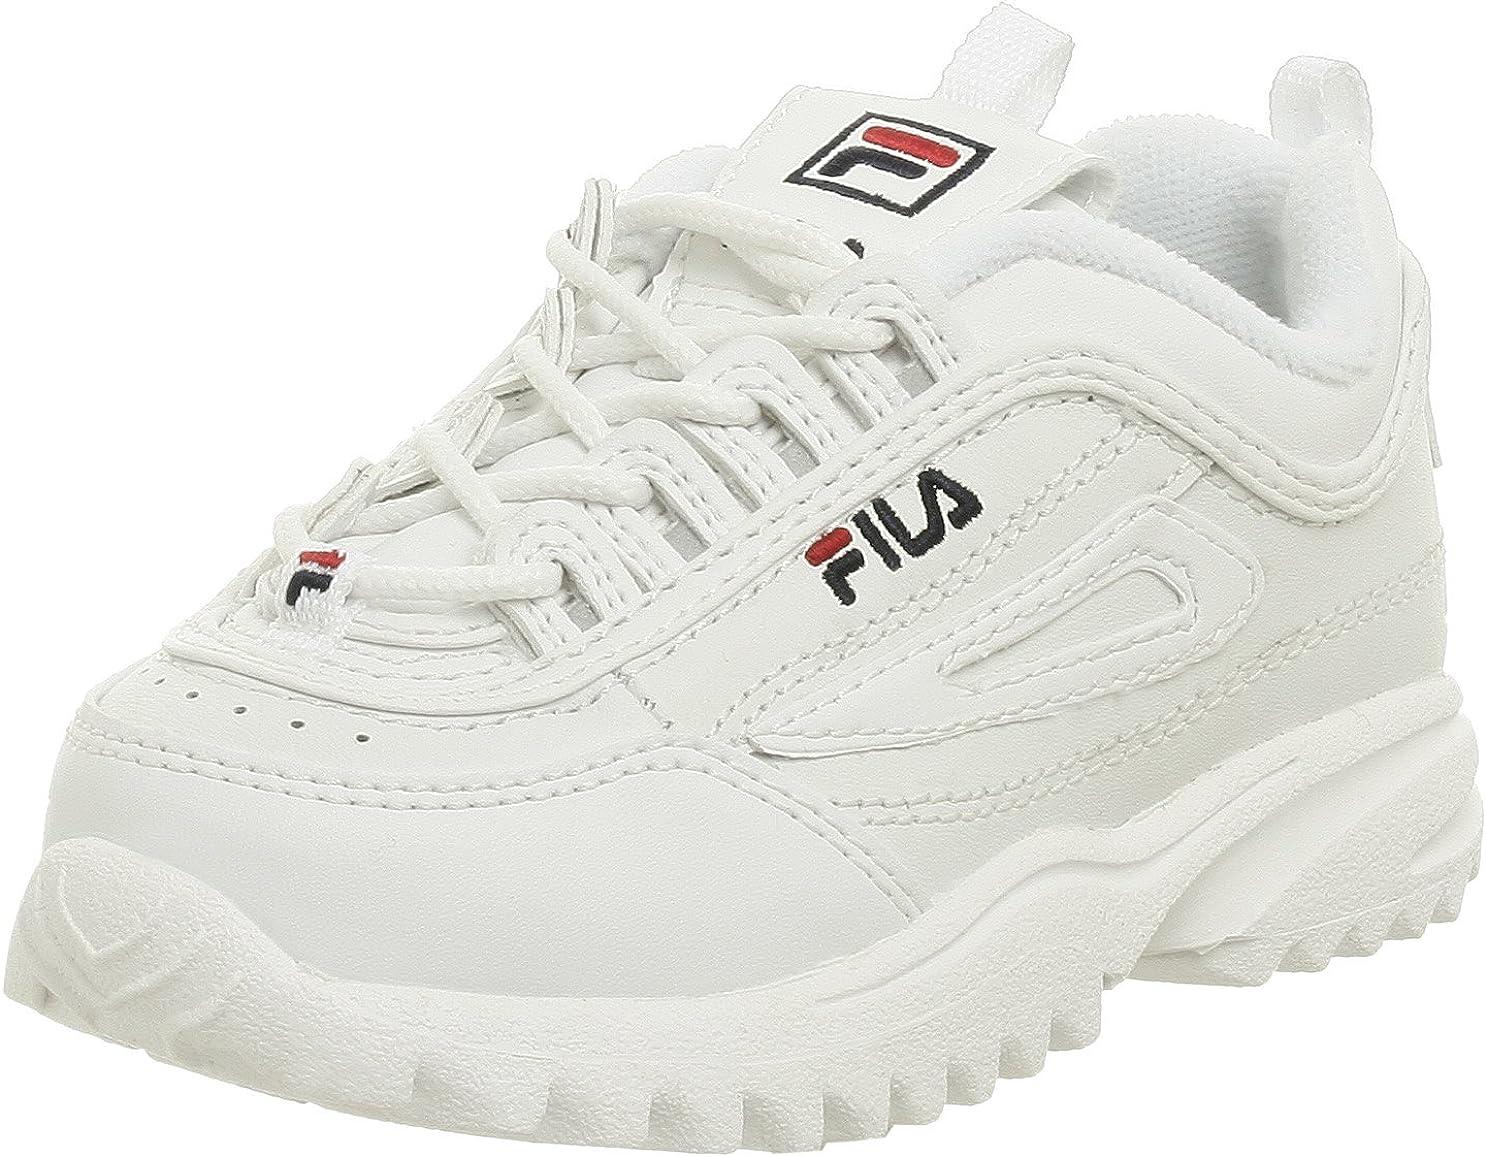 Fila Disruptor II Sneaker(Toddler